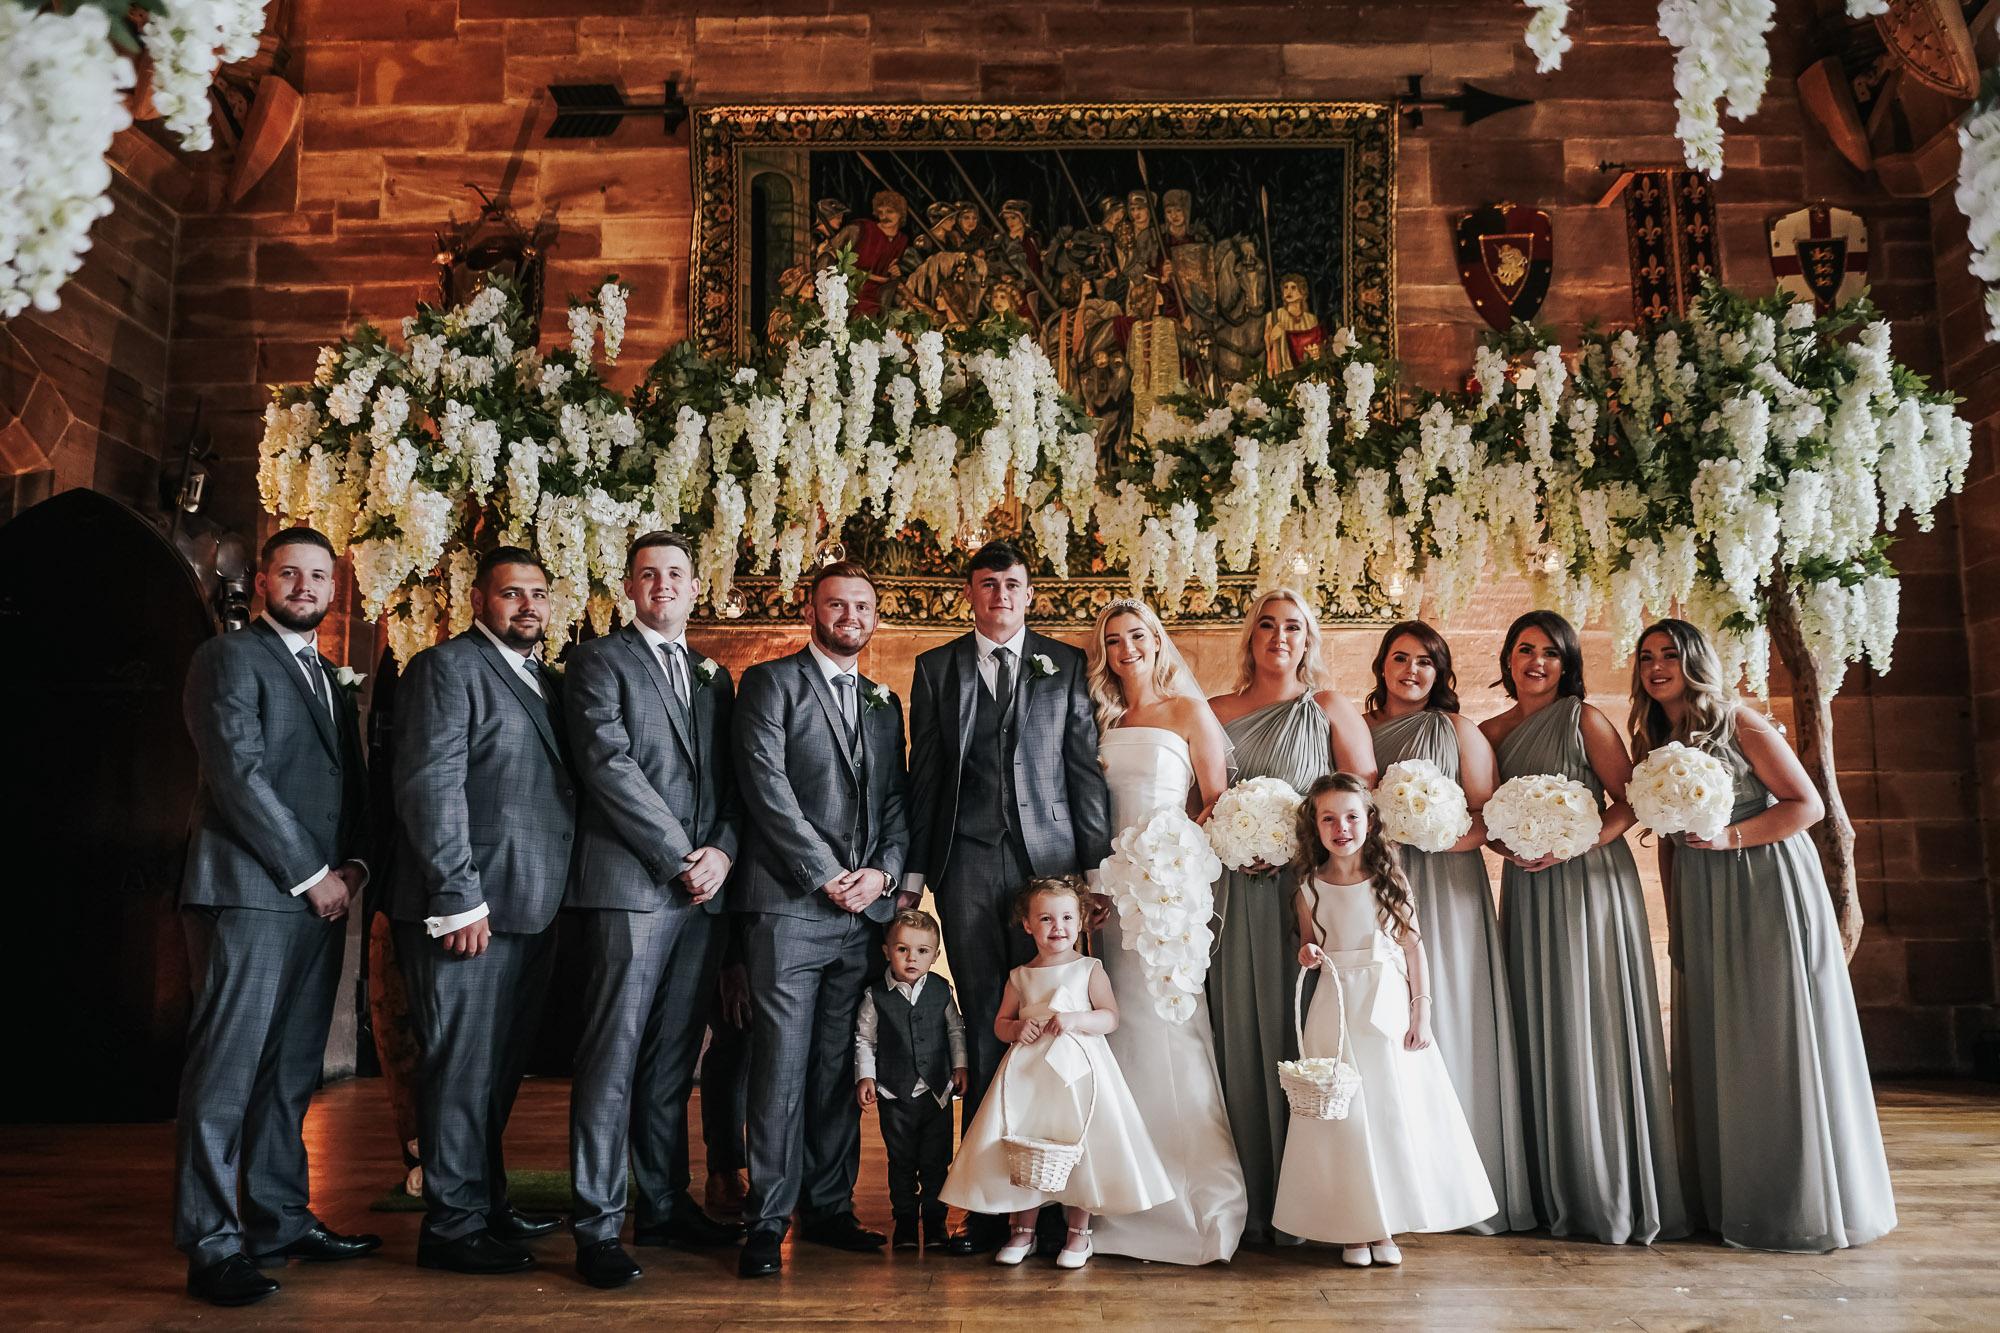 Peckforton Castle wedding photography cheshire wedding photographer (29 of 57).jpg